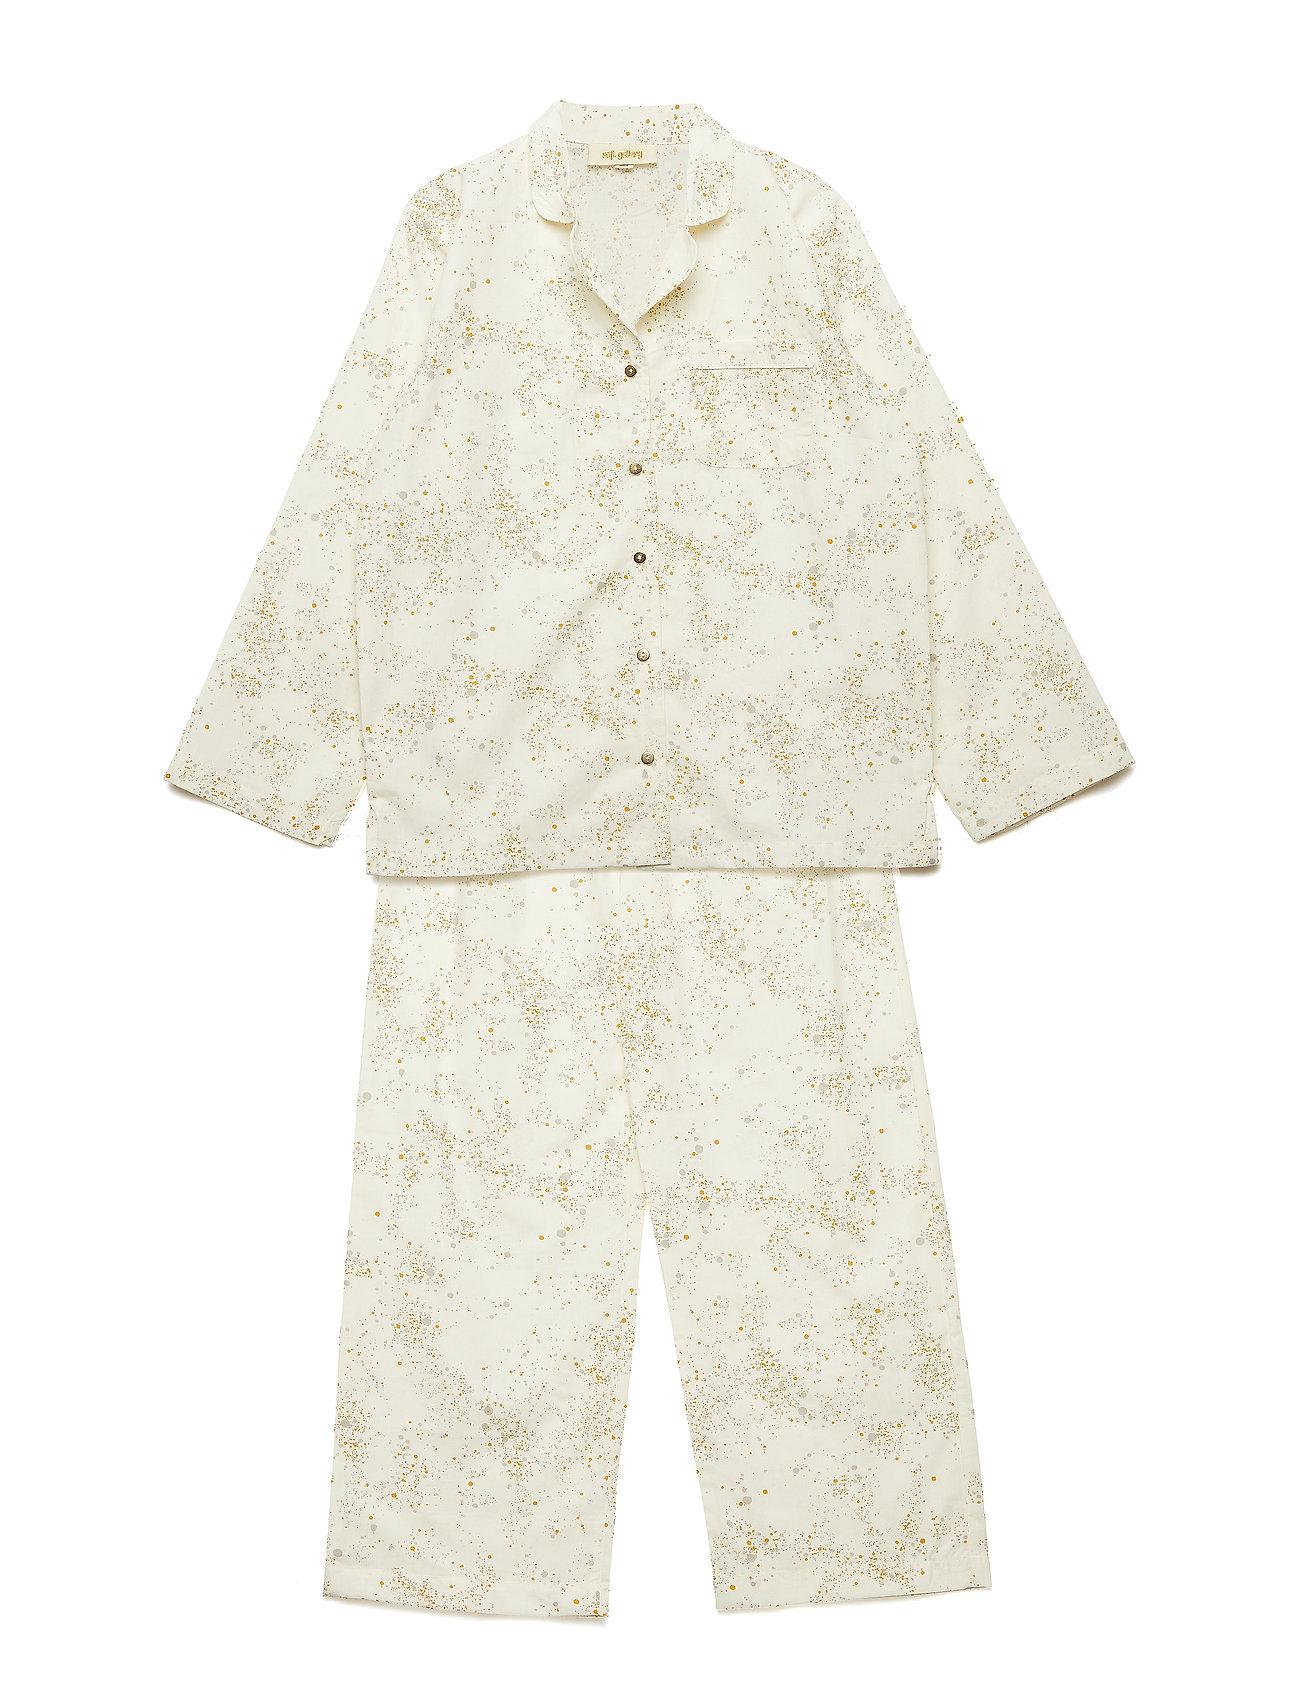 Soft Gallery Pajama - FLUFFY SKY, AOP MINI SPLASH CREAM